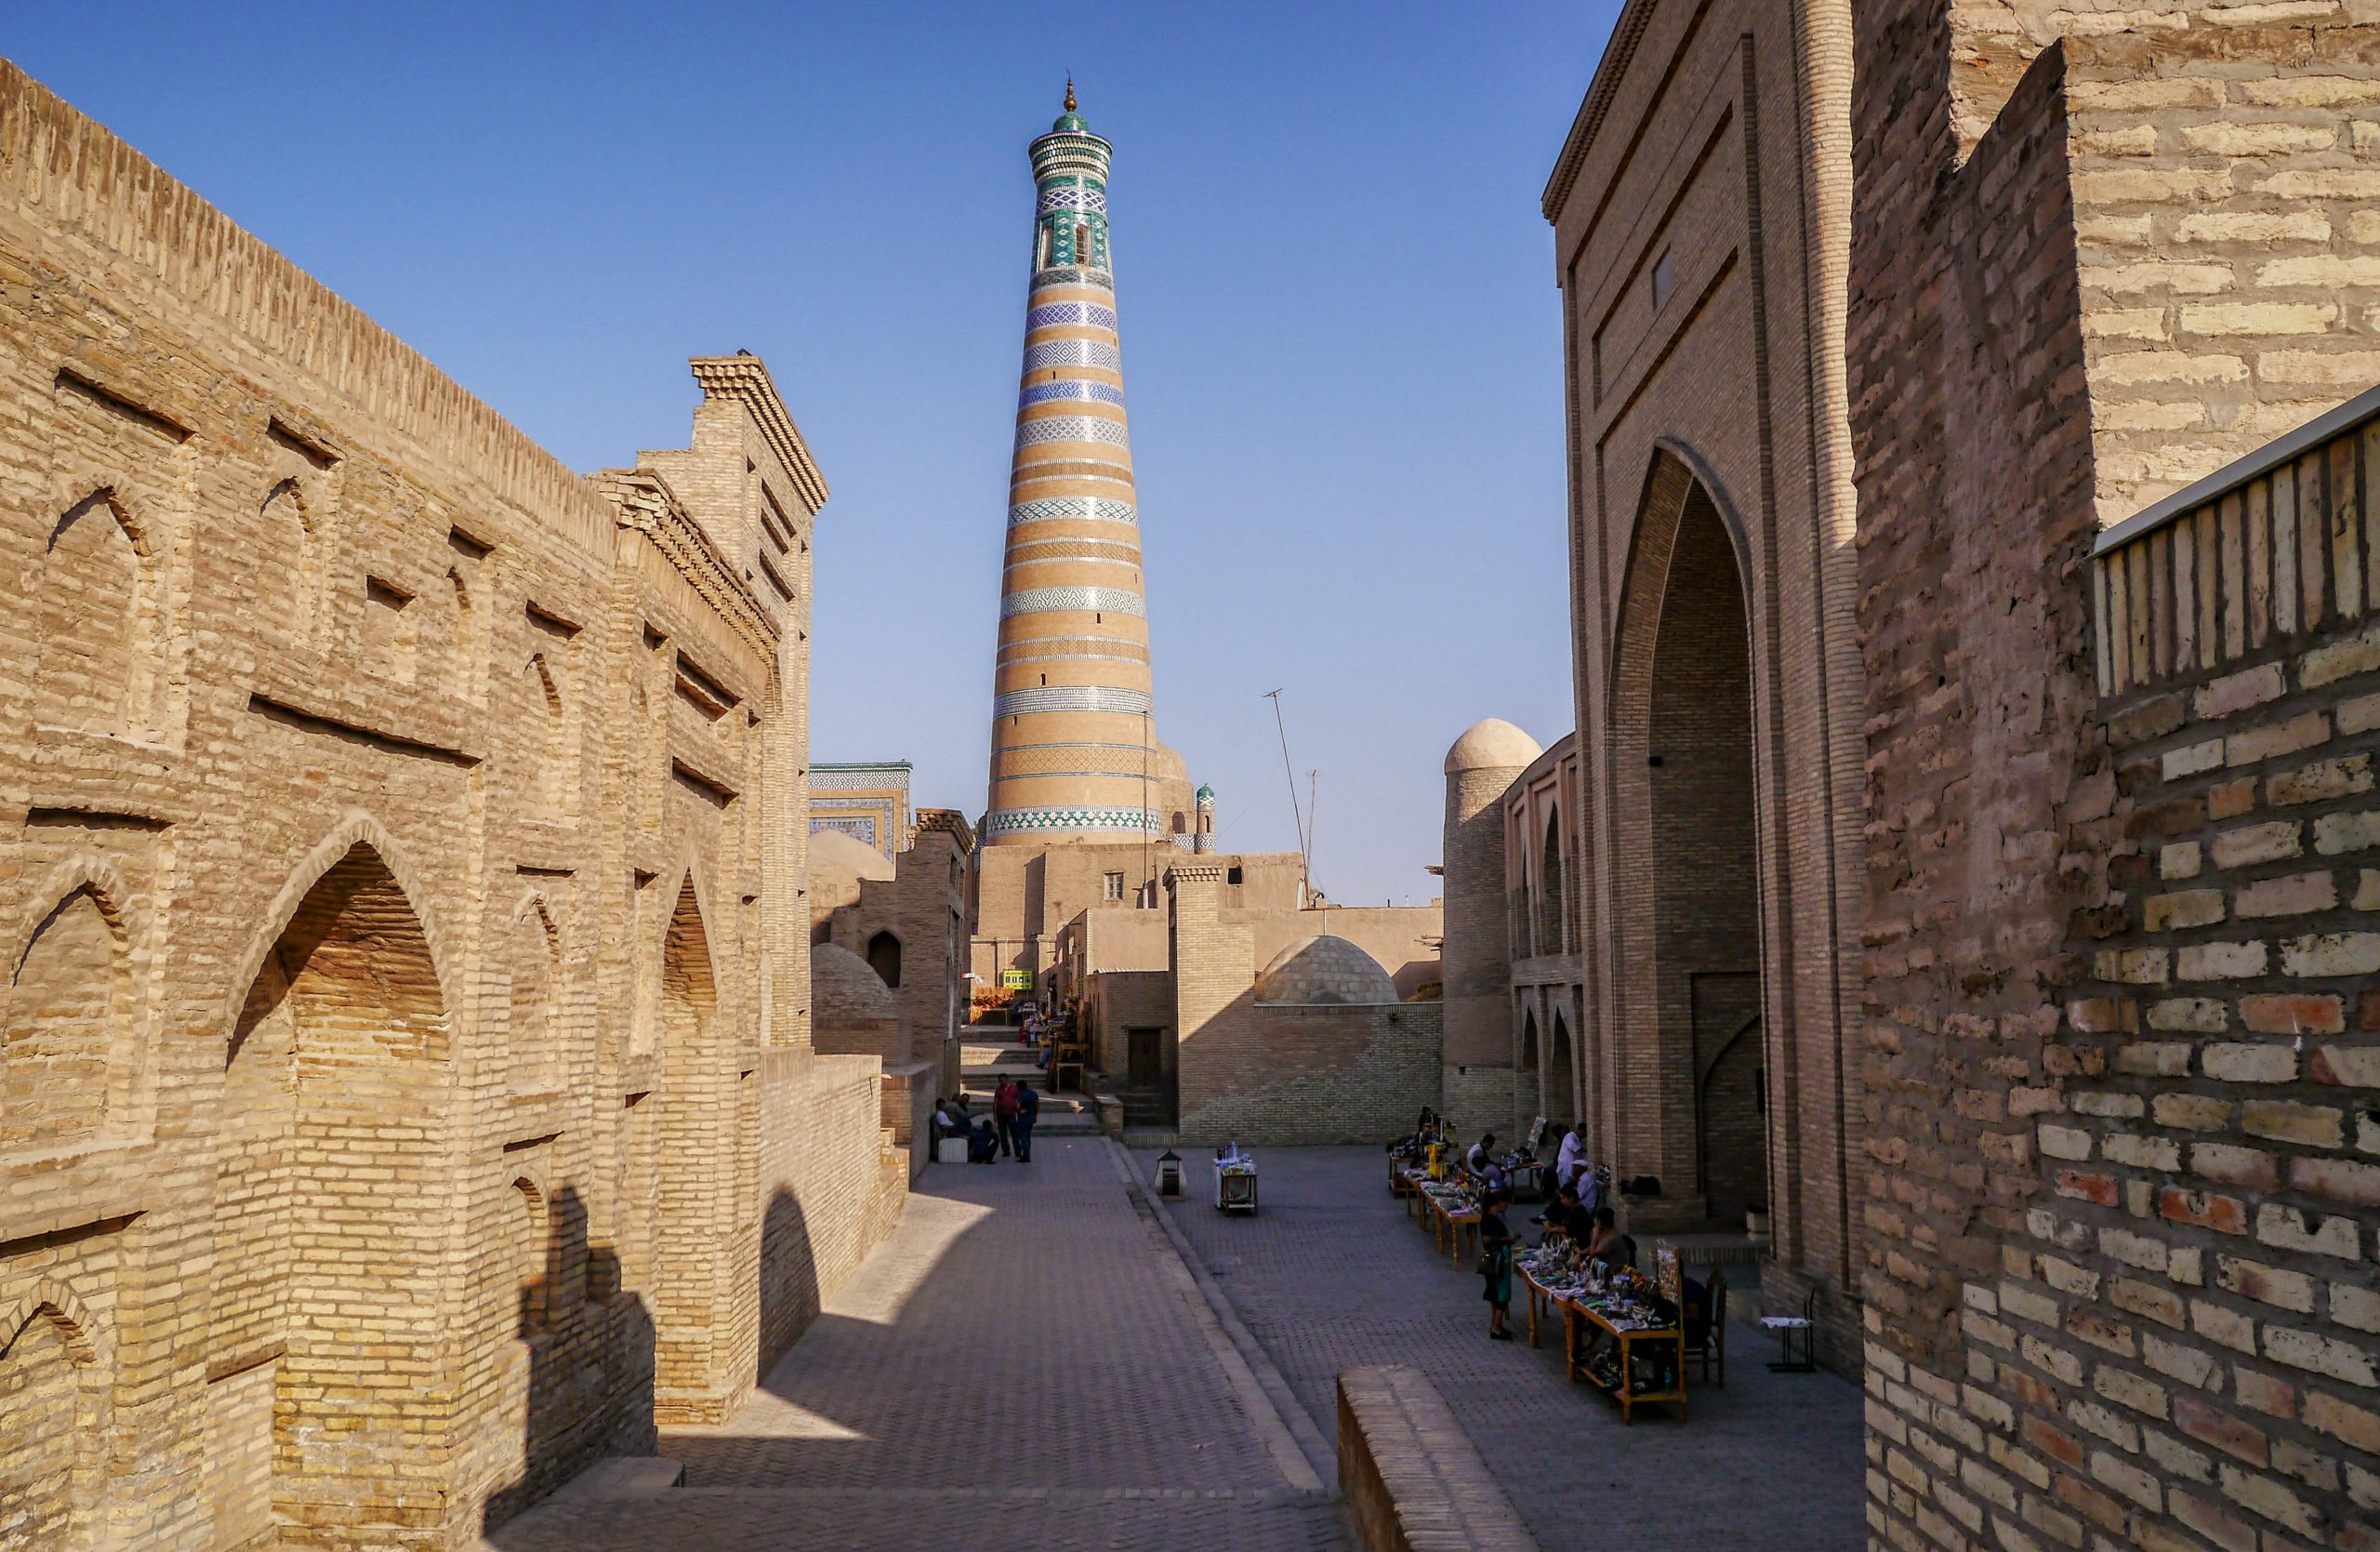 Noclegi w Chiwie Chiwa Khiva Uzbekistan